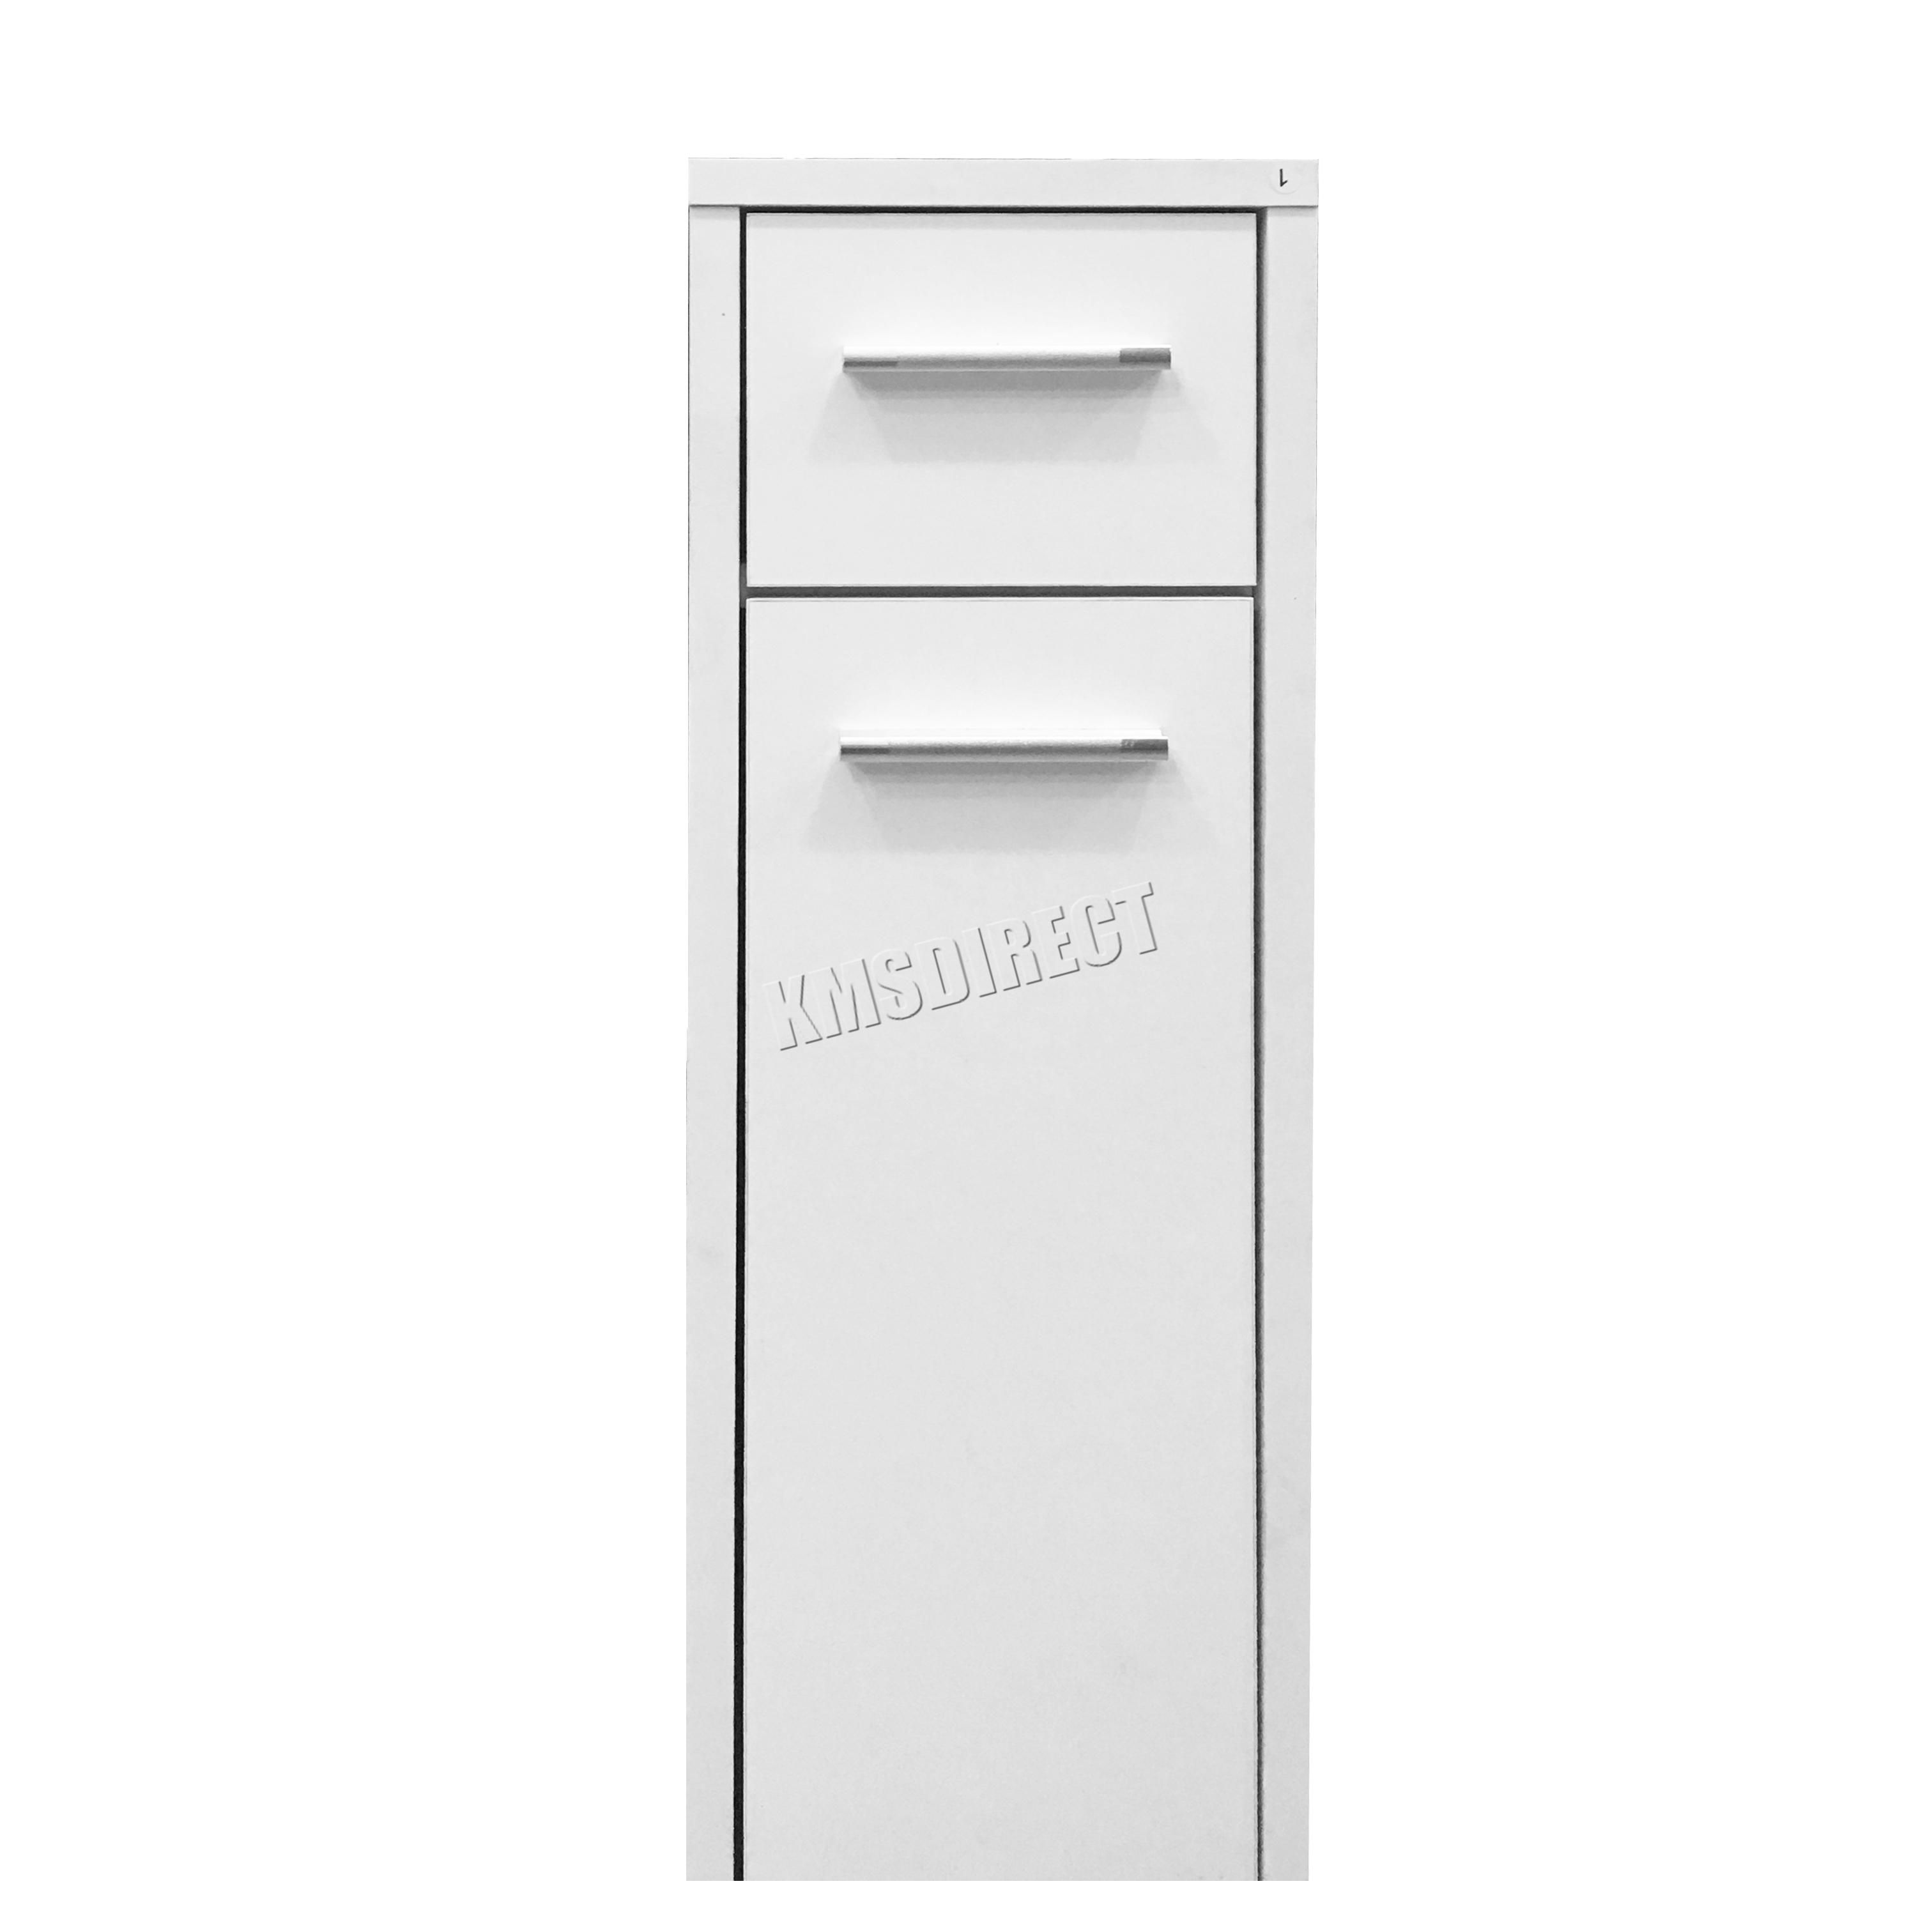 Thin Bathroom Cabinet Black Slim Bathroom Storage Cabinet Bathroom